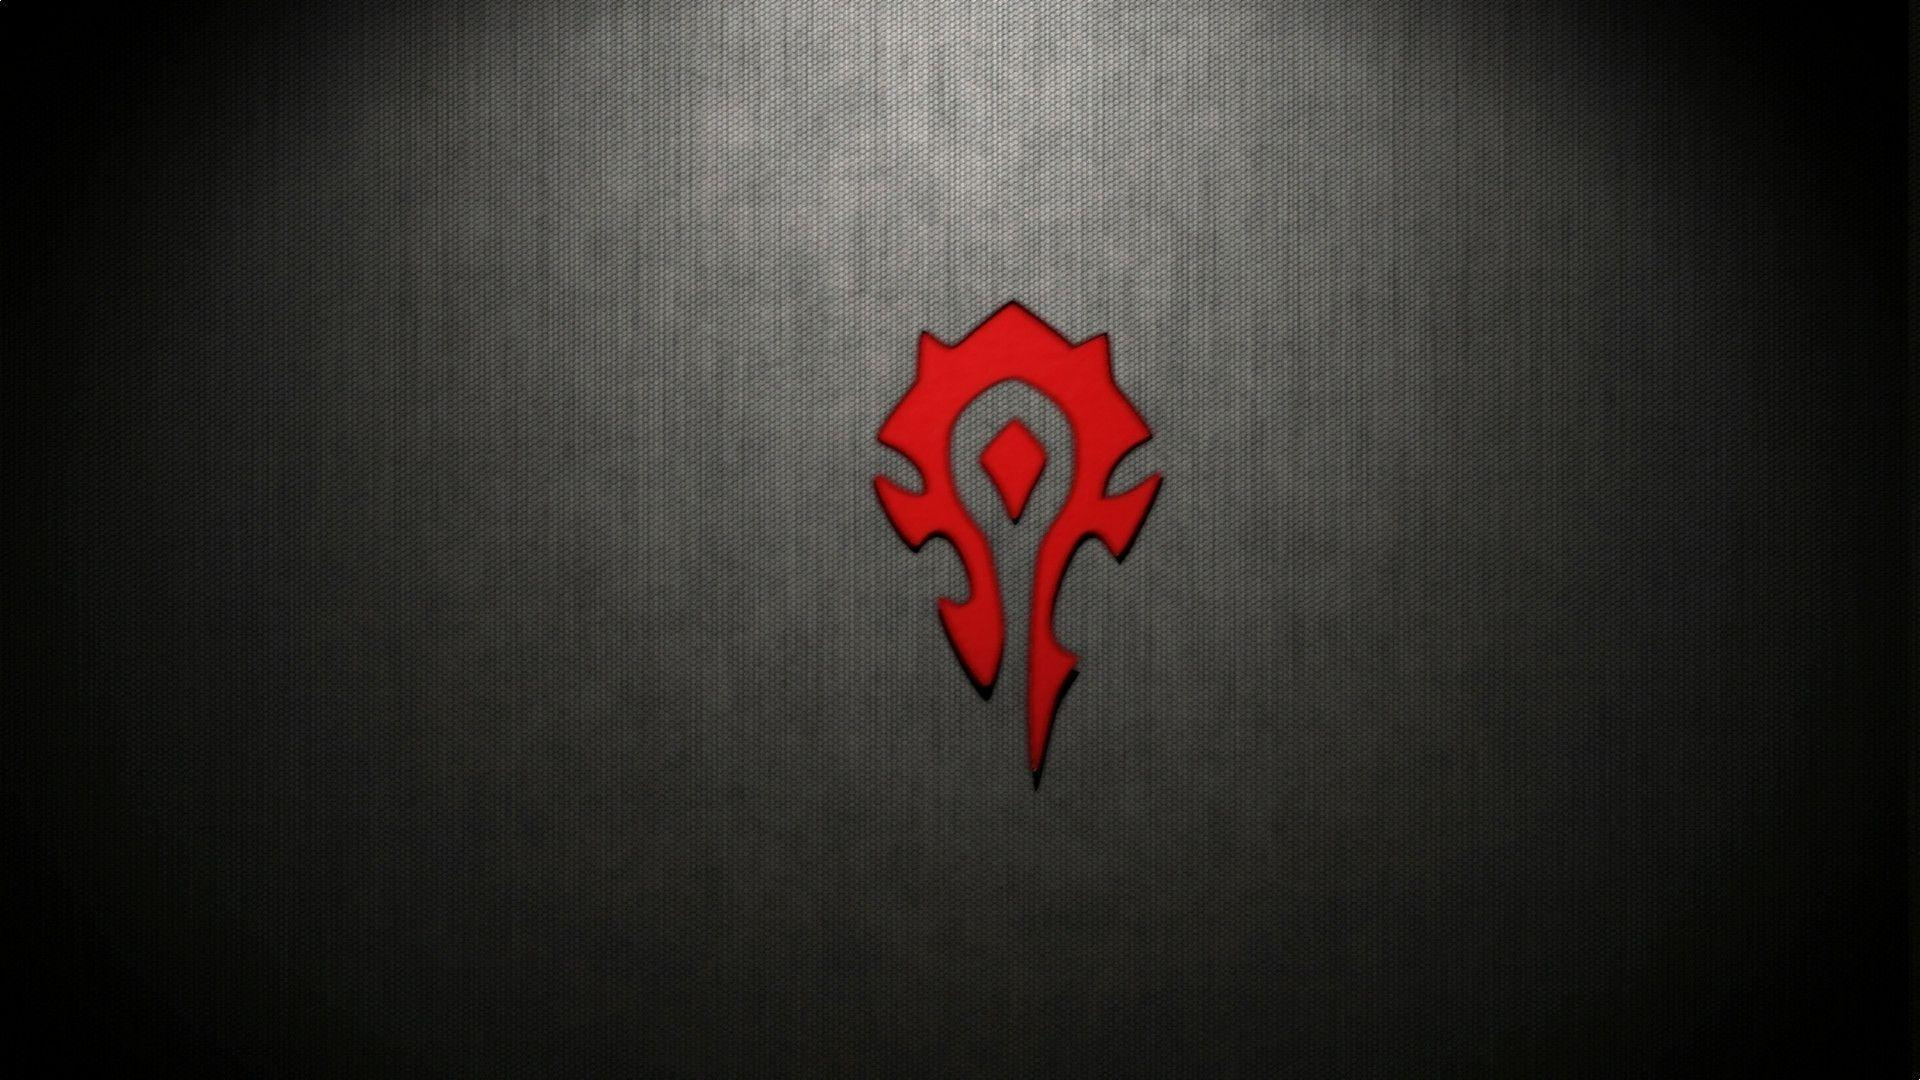 horde logo wallpapers - wallpaper cave